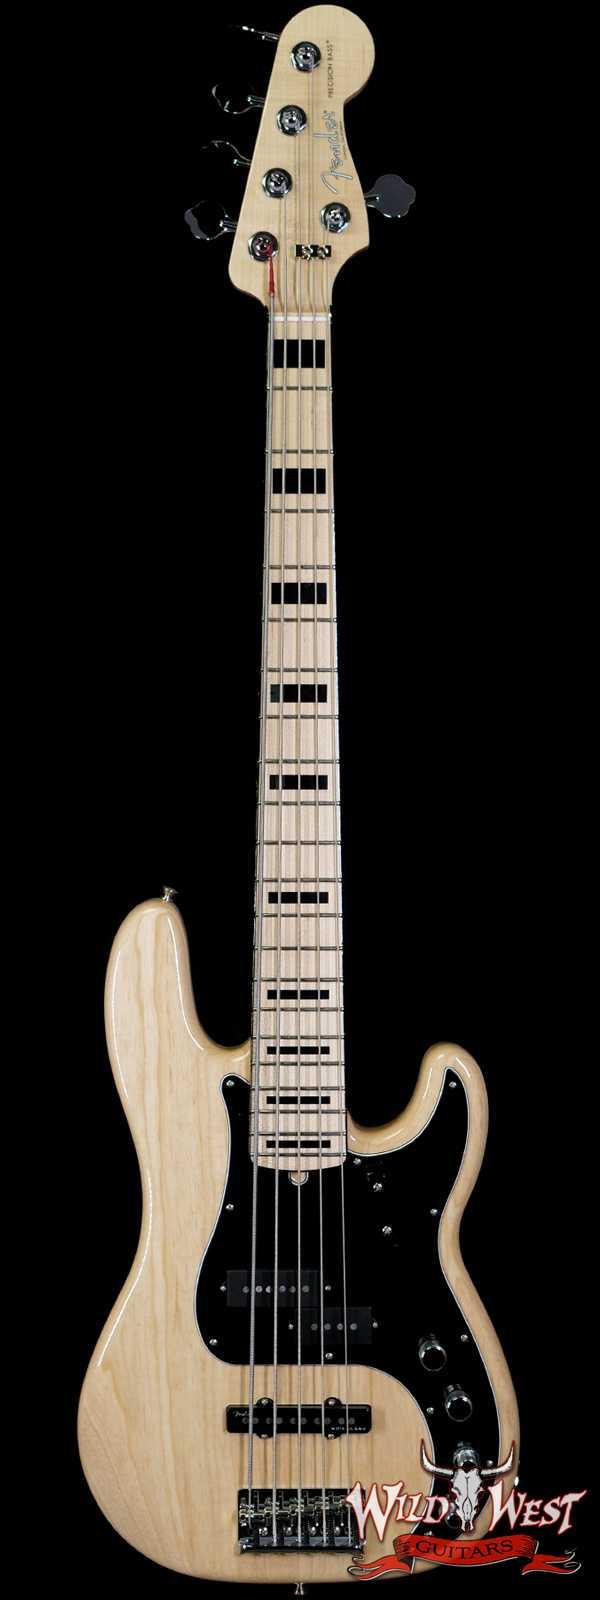 Fender Custom Shop Paul Waller Maserbuilt P-Bass Special V Active P/J  Pickups 5-String Precison Bass Natural